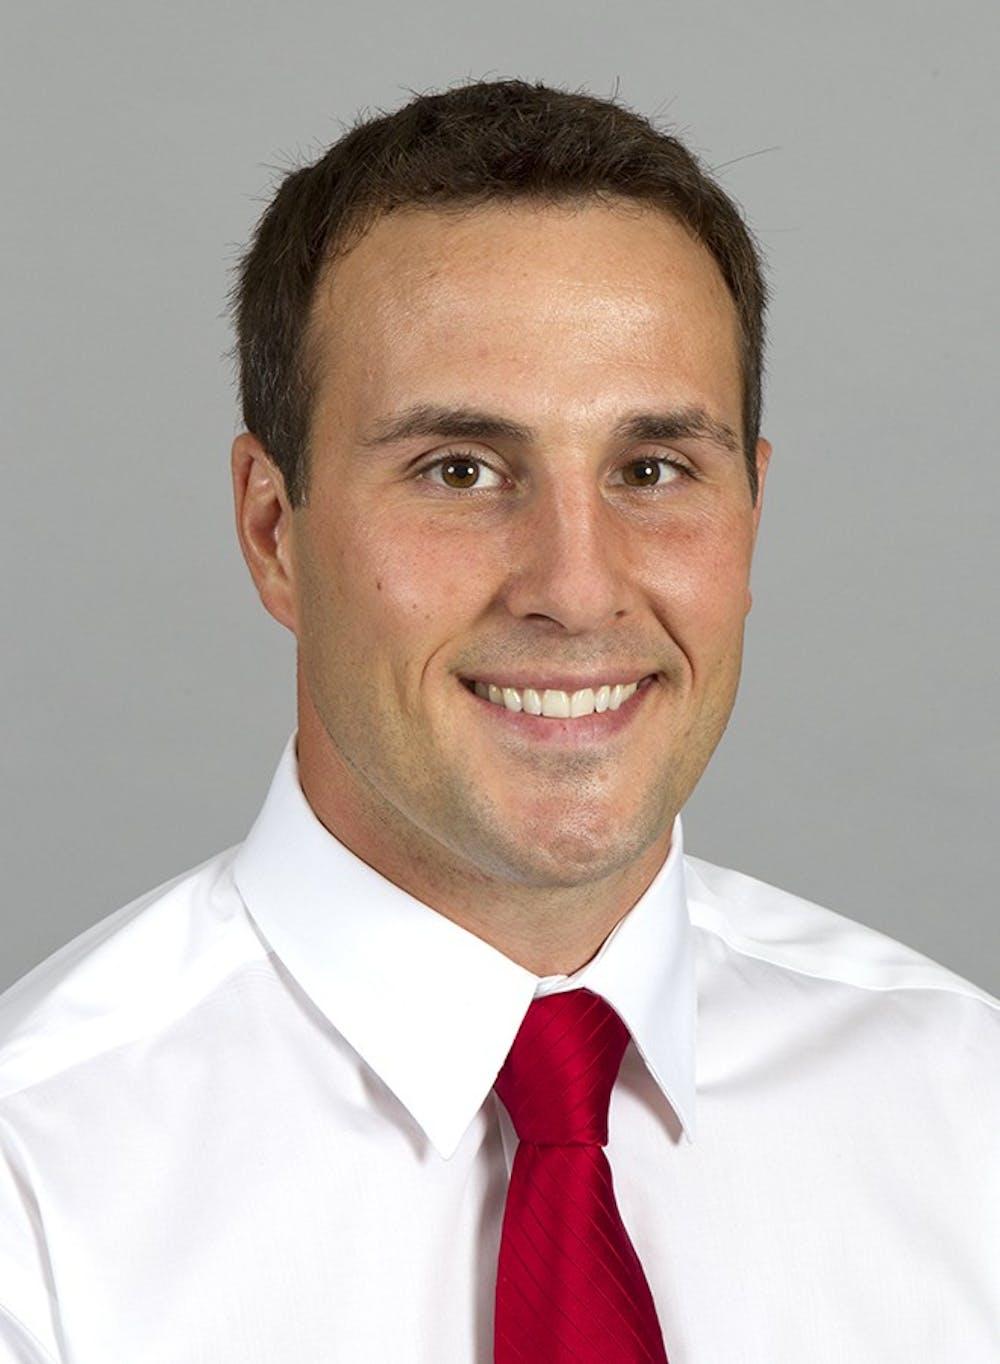 Stanford's Jason Borrelli hired as new head coach of AU wrestling